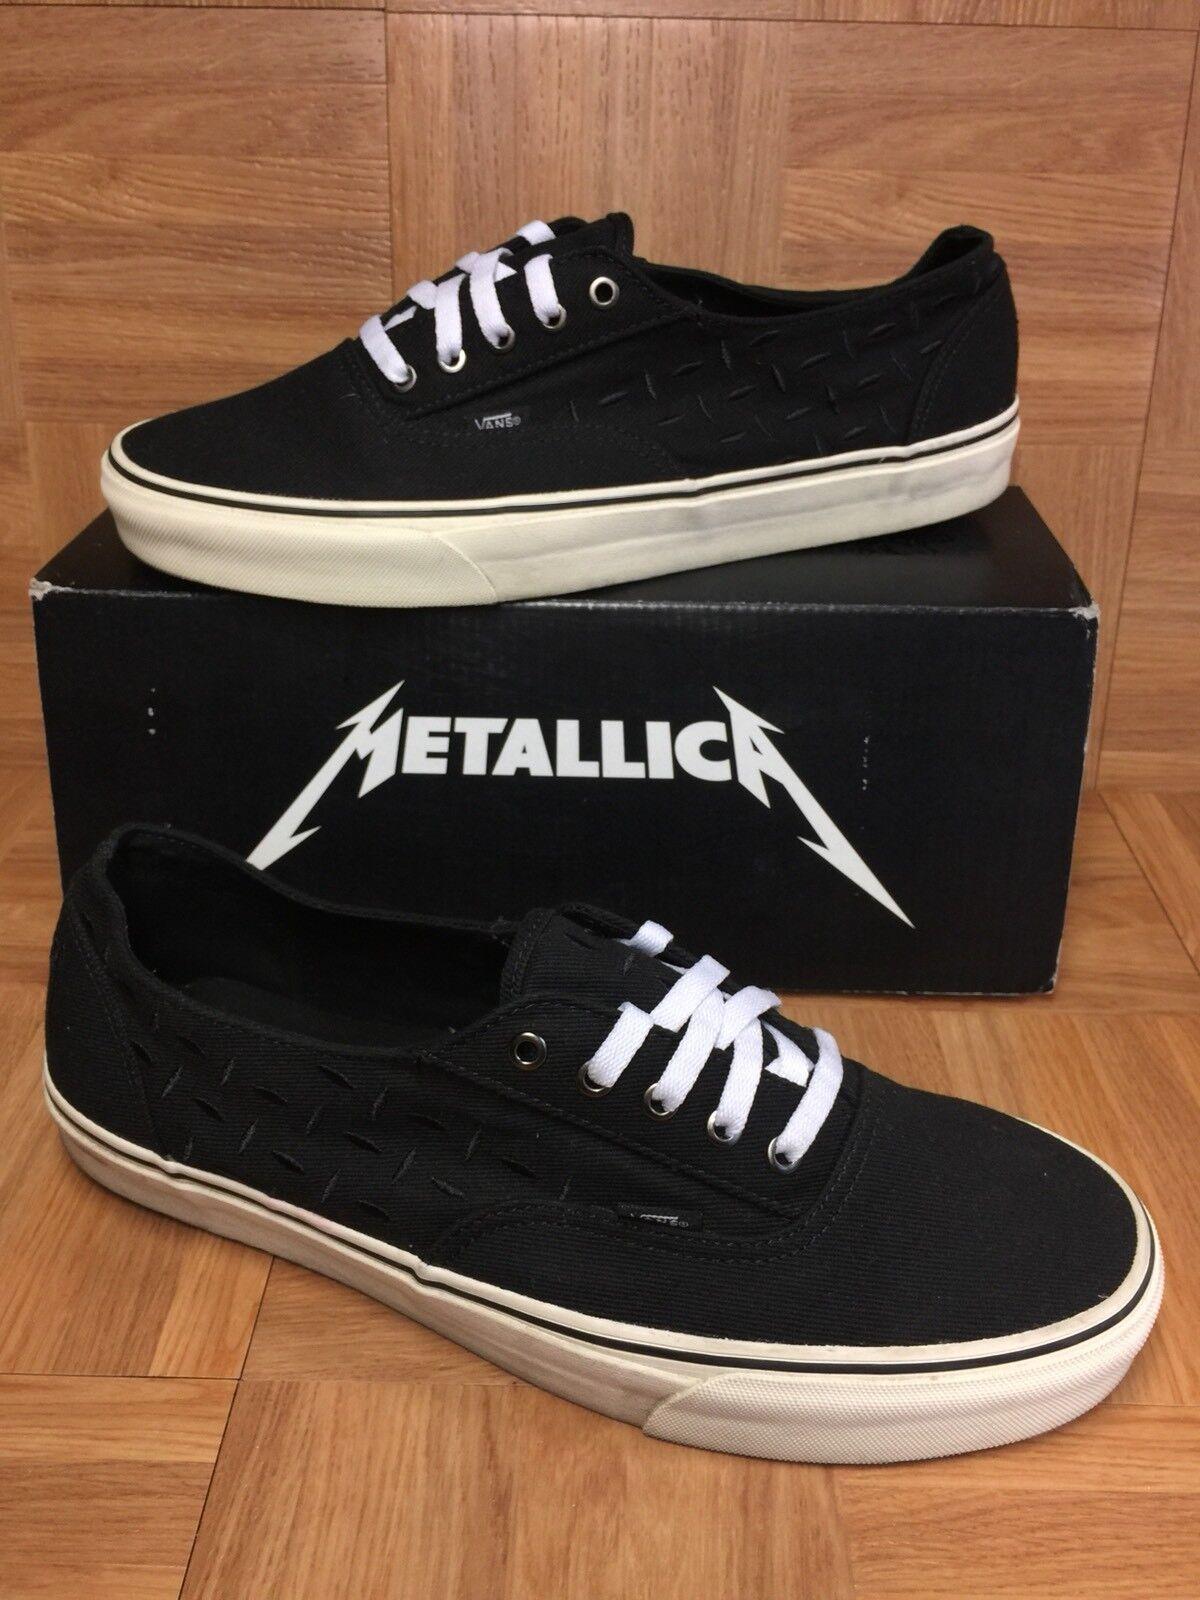 RARE VANS Metallica Lars Ulrich Laceless Laceless Laceless Era Uomo scarpe Sz 13 nero bianca LE 891743